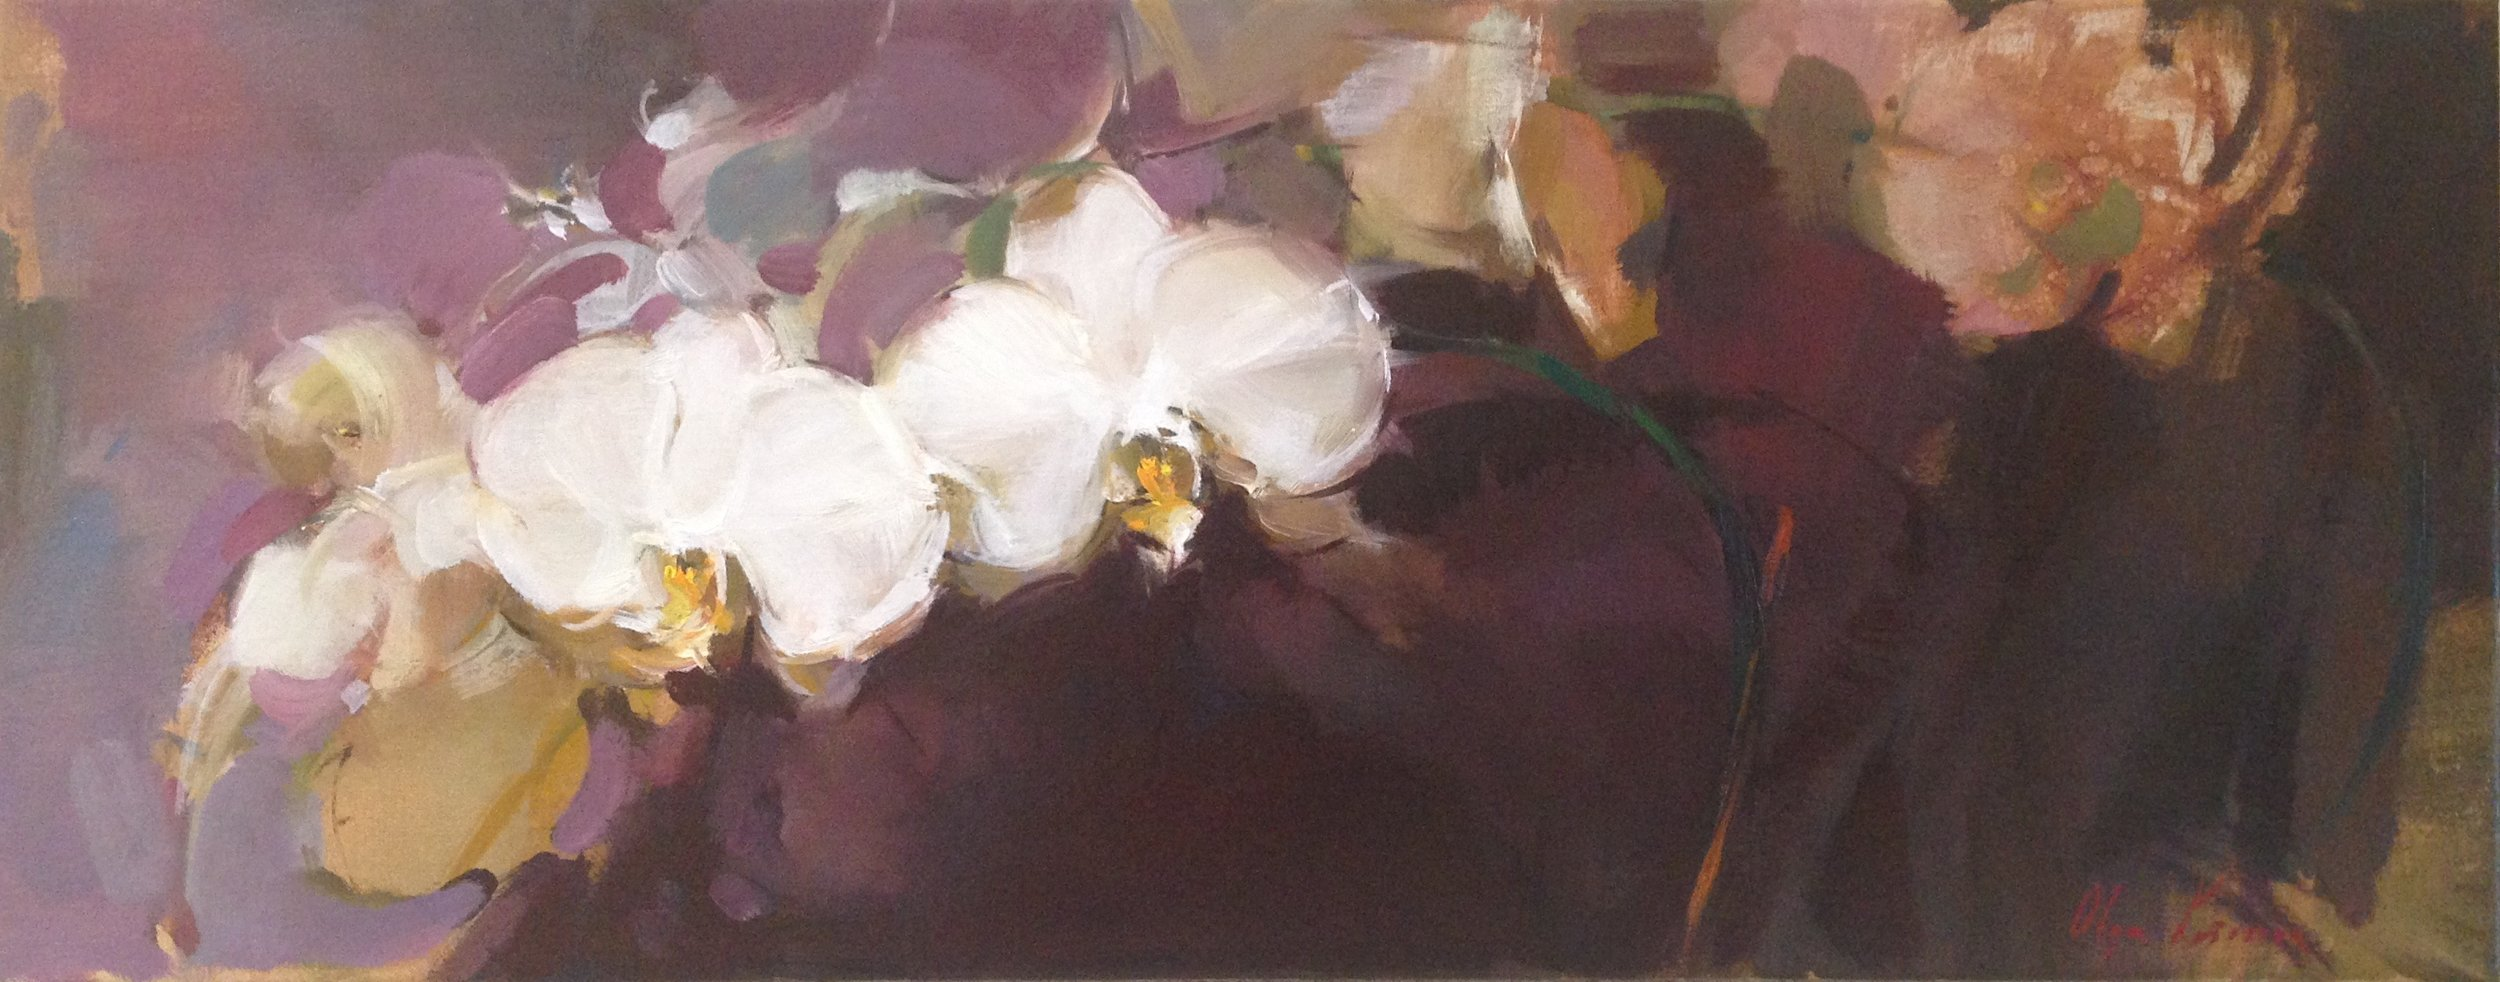 Orchids_12x30.JPG